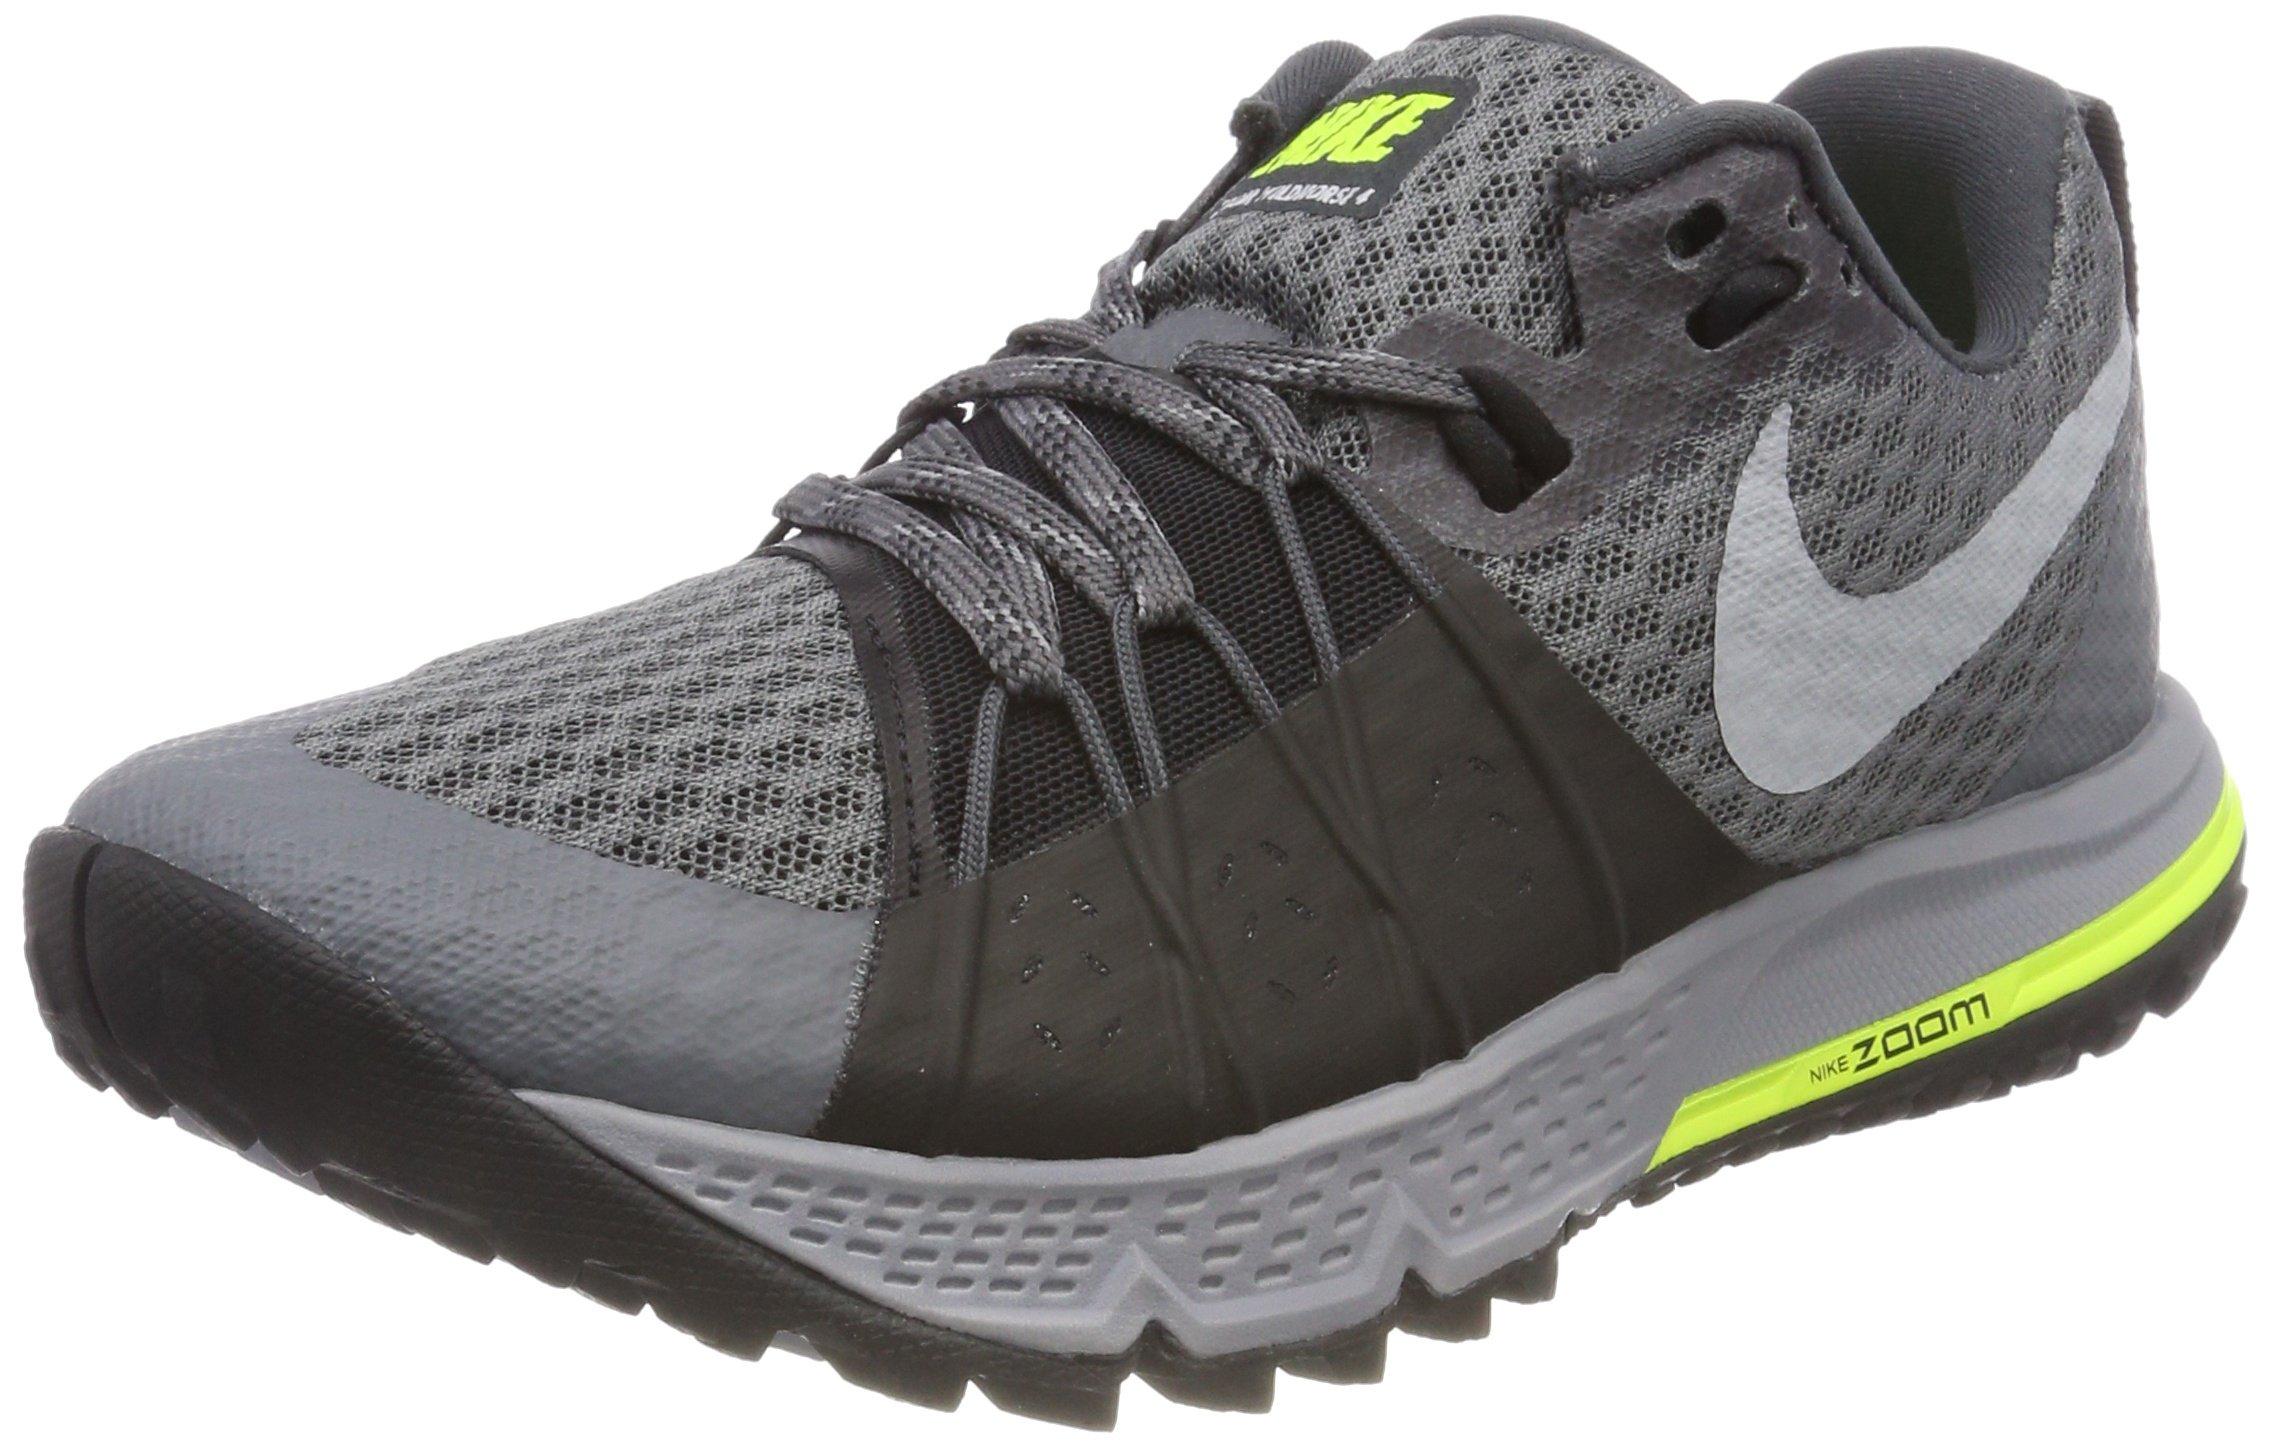 20e8567bd2e Galleon - Nike Air Zoom Wildhorse 4 Sz 8.5 Womens Running Dark Grey Wolf  Grey-Black-Stealth Shoes